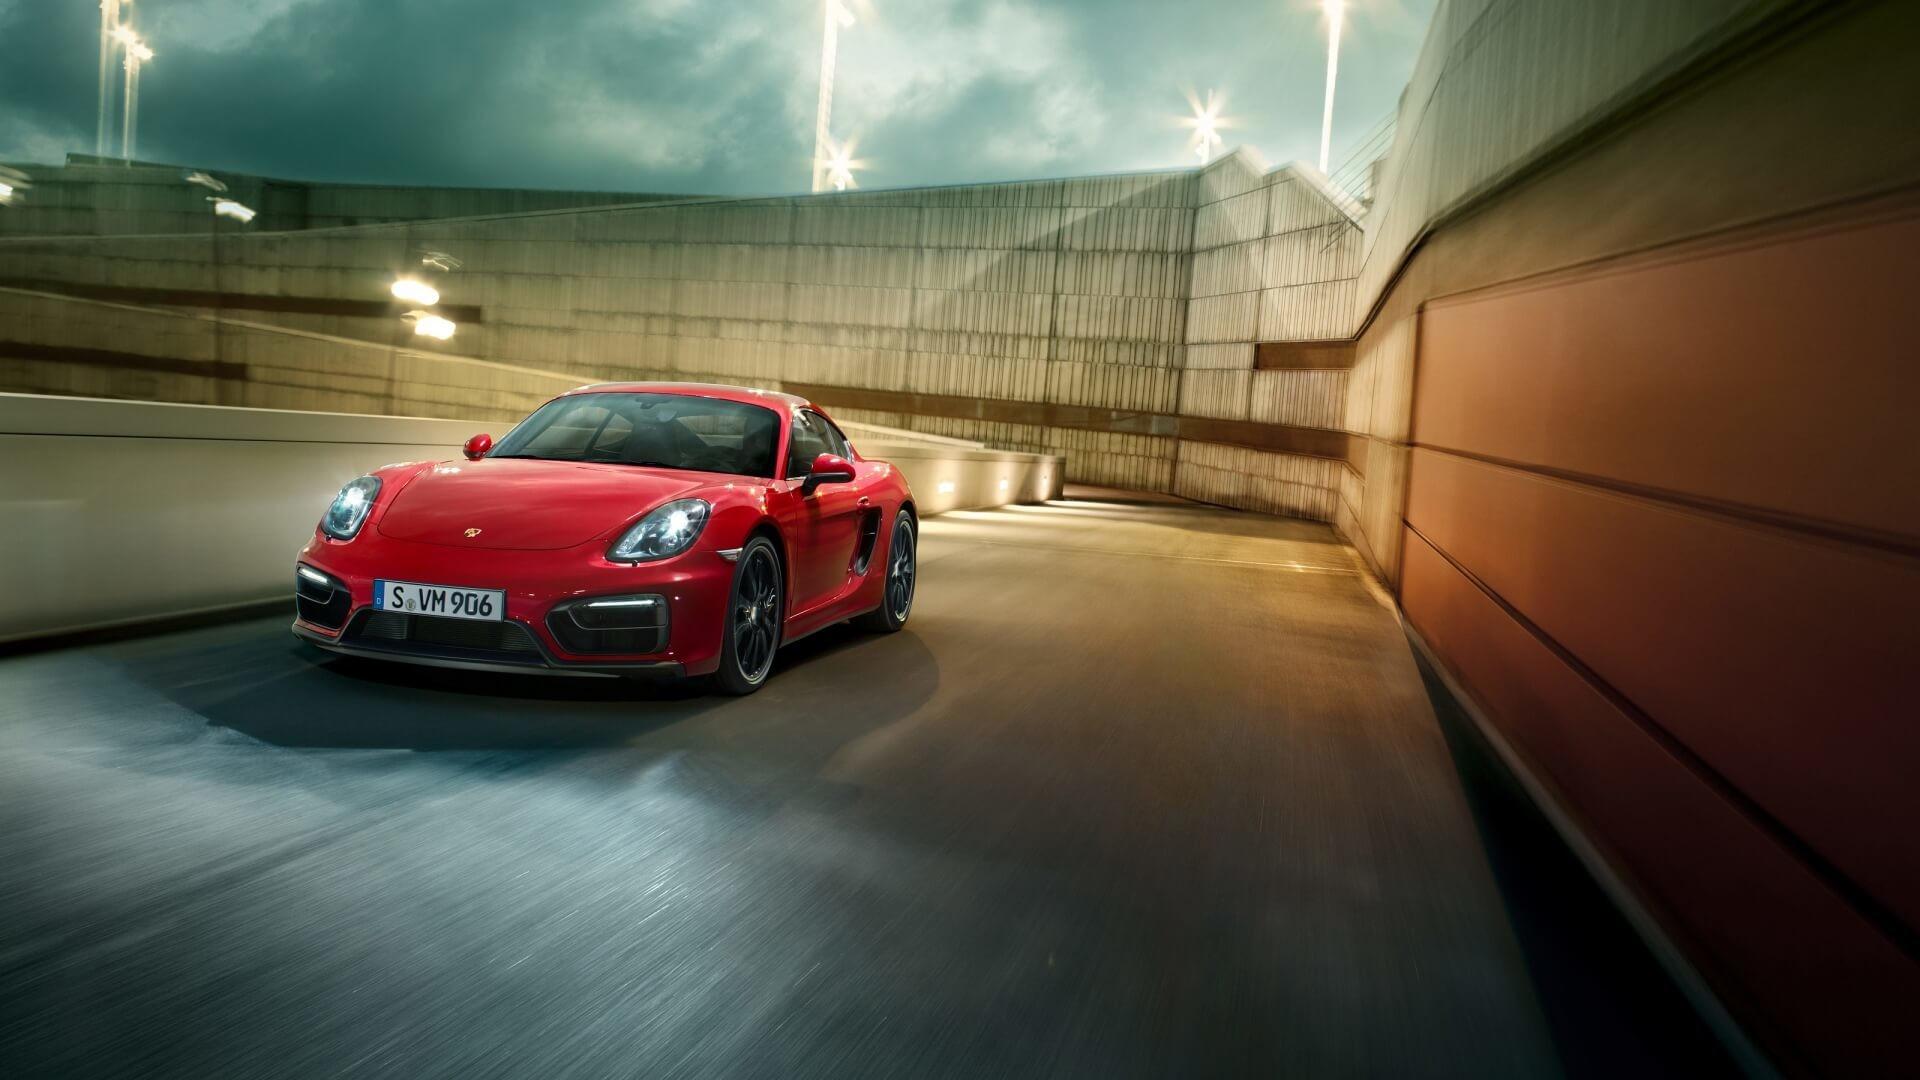 3000x2000 Porsche Carrera GT Download Desktop Wallpaper